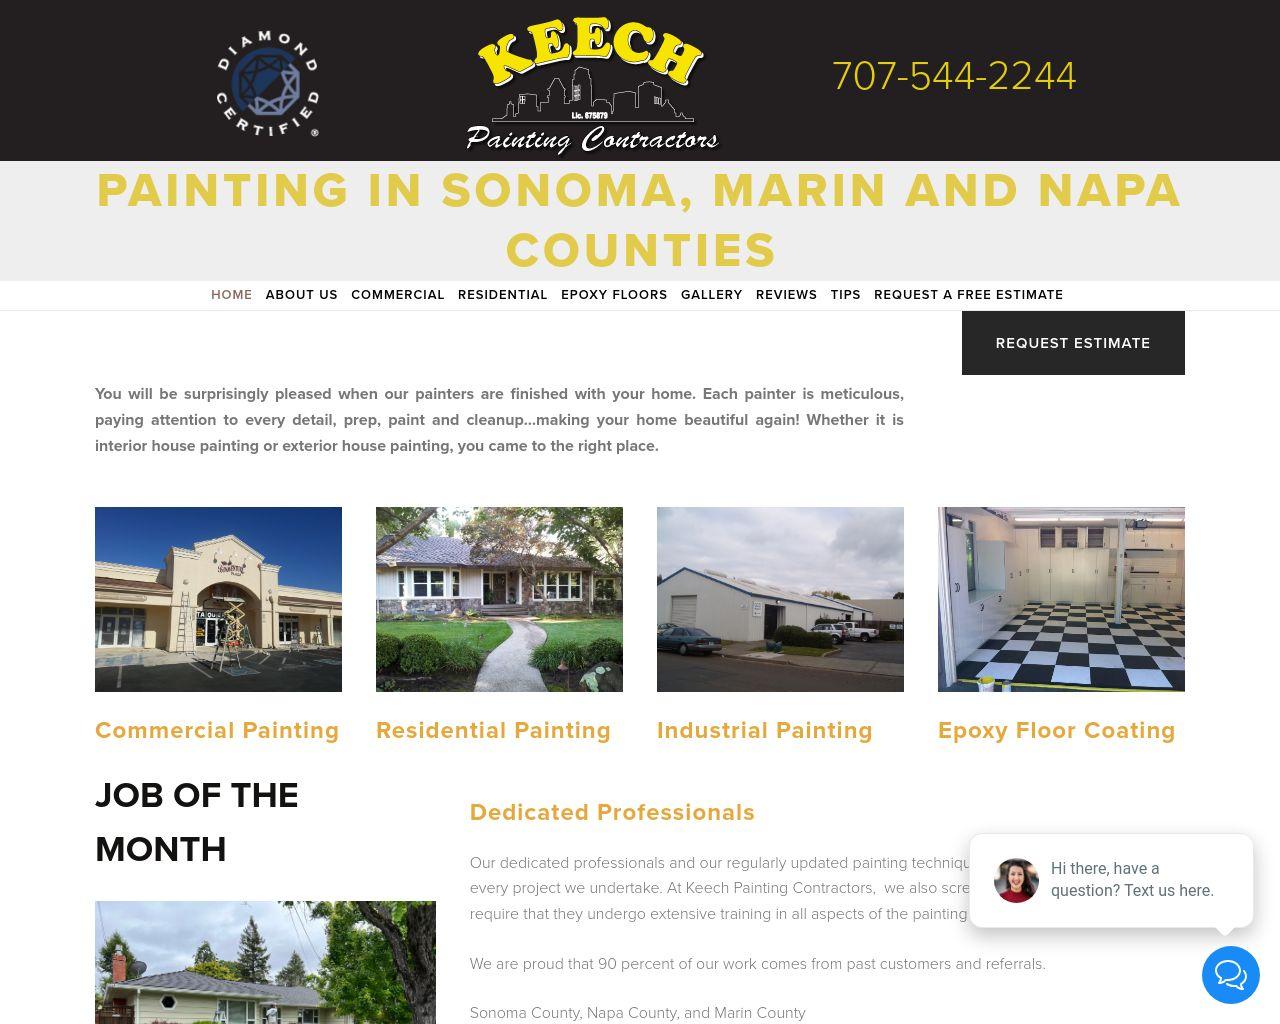 Keech Painting Contractors, Inc    Diamond Certified